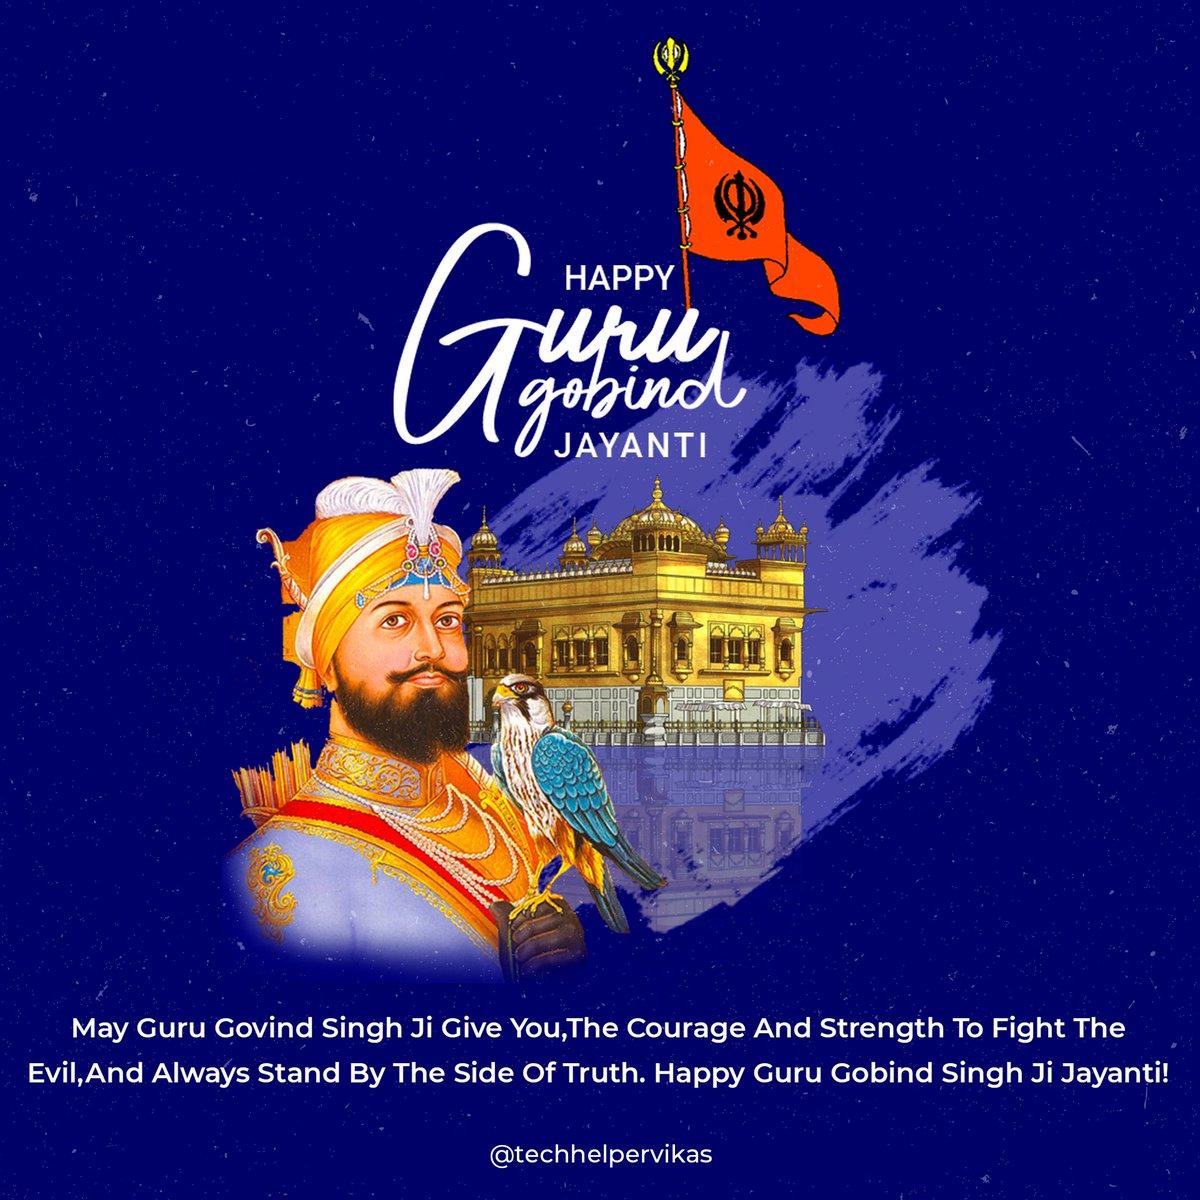 Waheguru Ji ka khalsa, Waheguru ji ki fateh. Happy Guru Gobind Singh Jayanti to you and your family. #gurugobindsinghjayanti #gurupurab #GuruGobindSingh #gurugobindsinghji https://t.co/owA2YxDzxJ